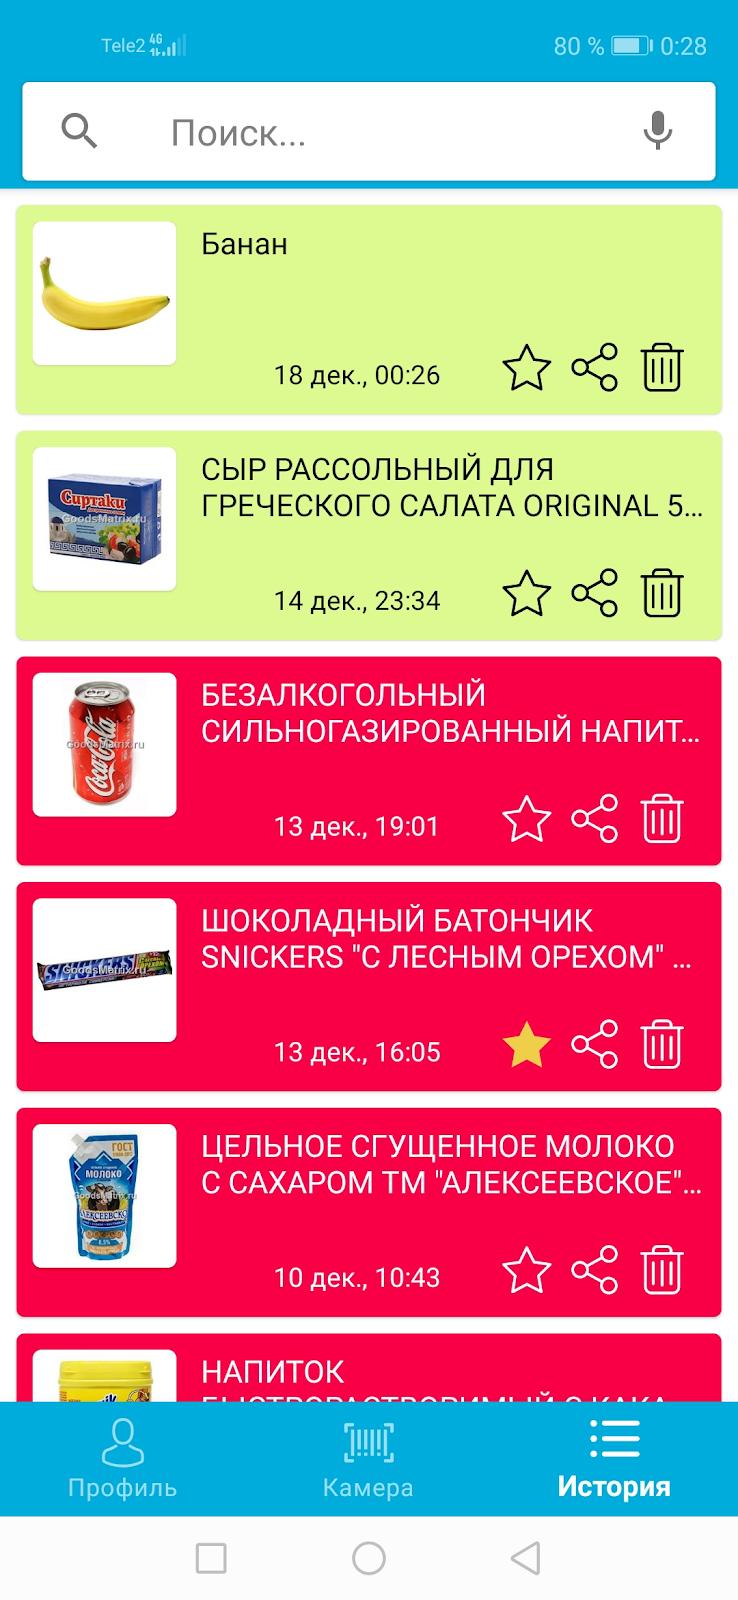 Техновыпуск Mail.ru Group, зима 2019 - 19